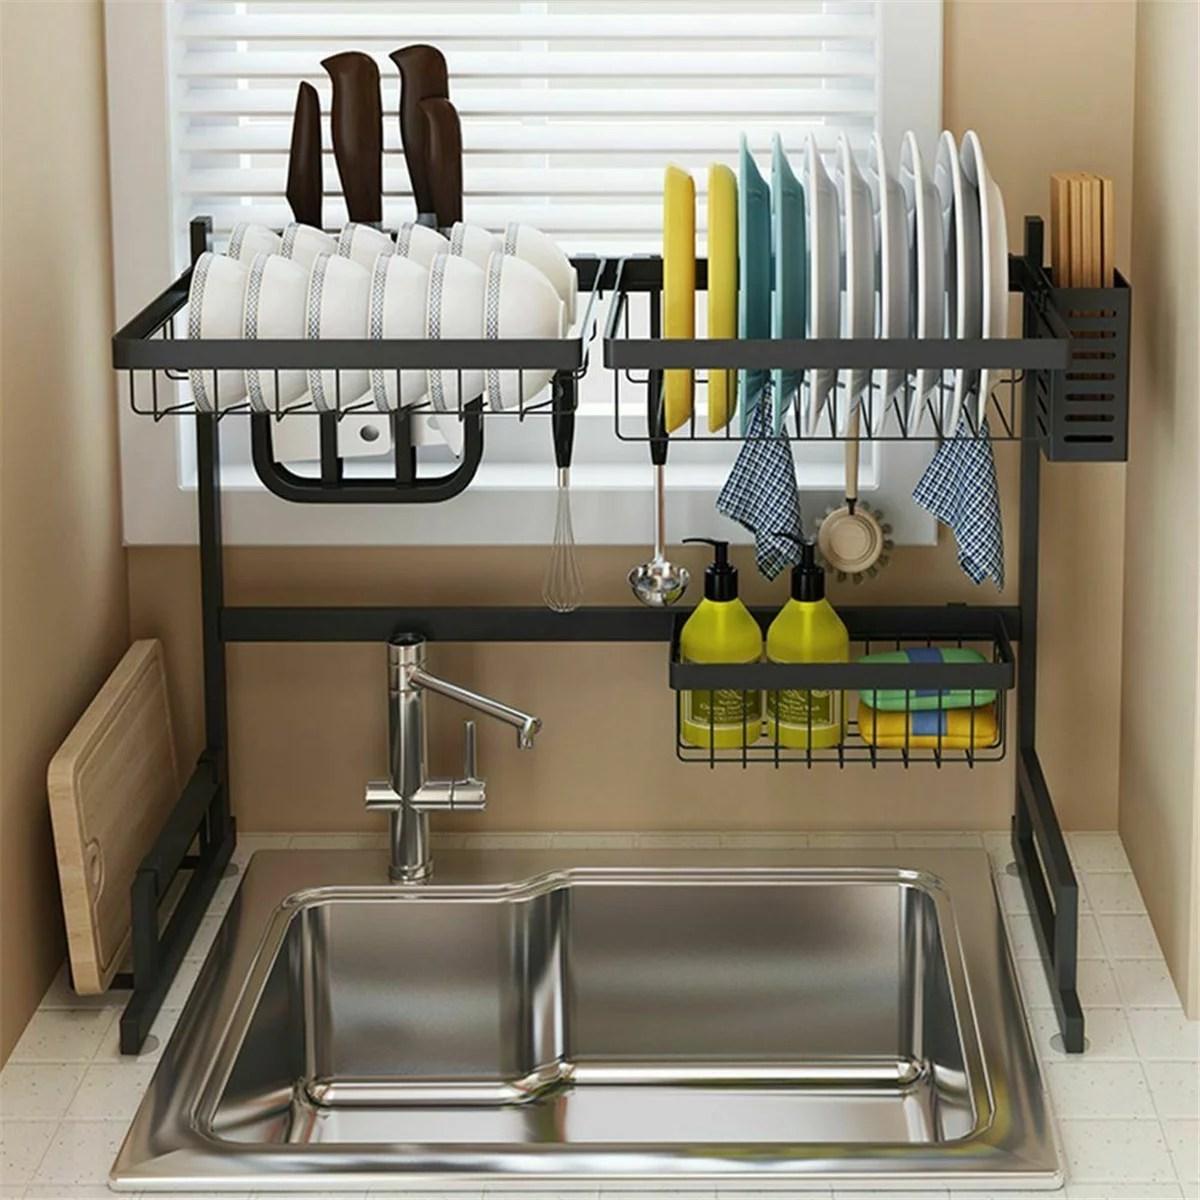 sink rack dish drainer for kitchen sink racks stainless steel over the sink shelf storage rack